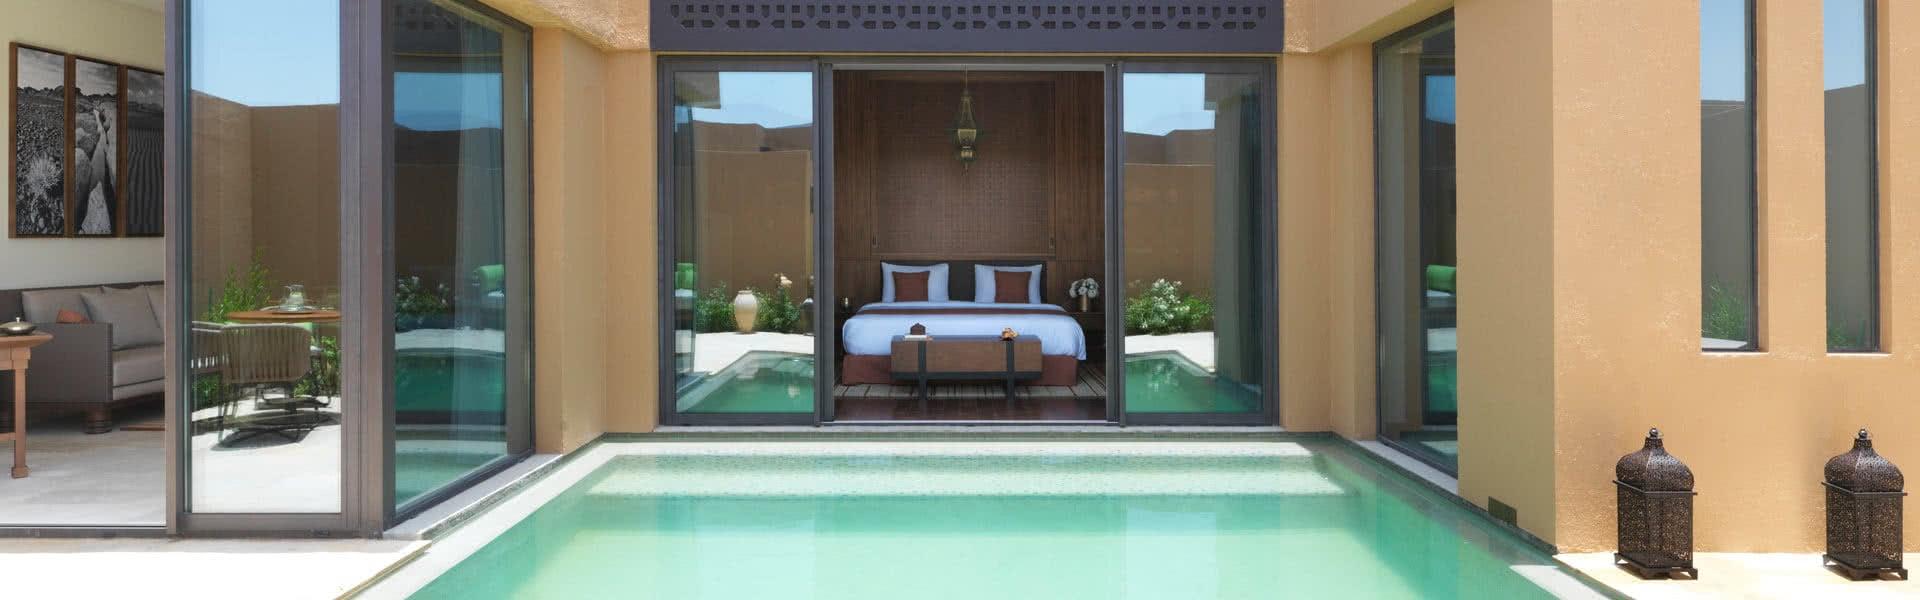 Pool Villa Luxury In Oman.